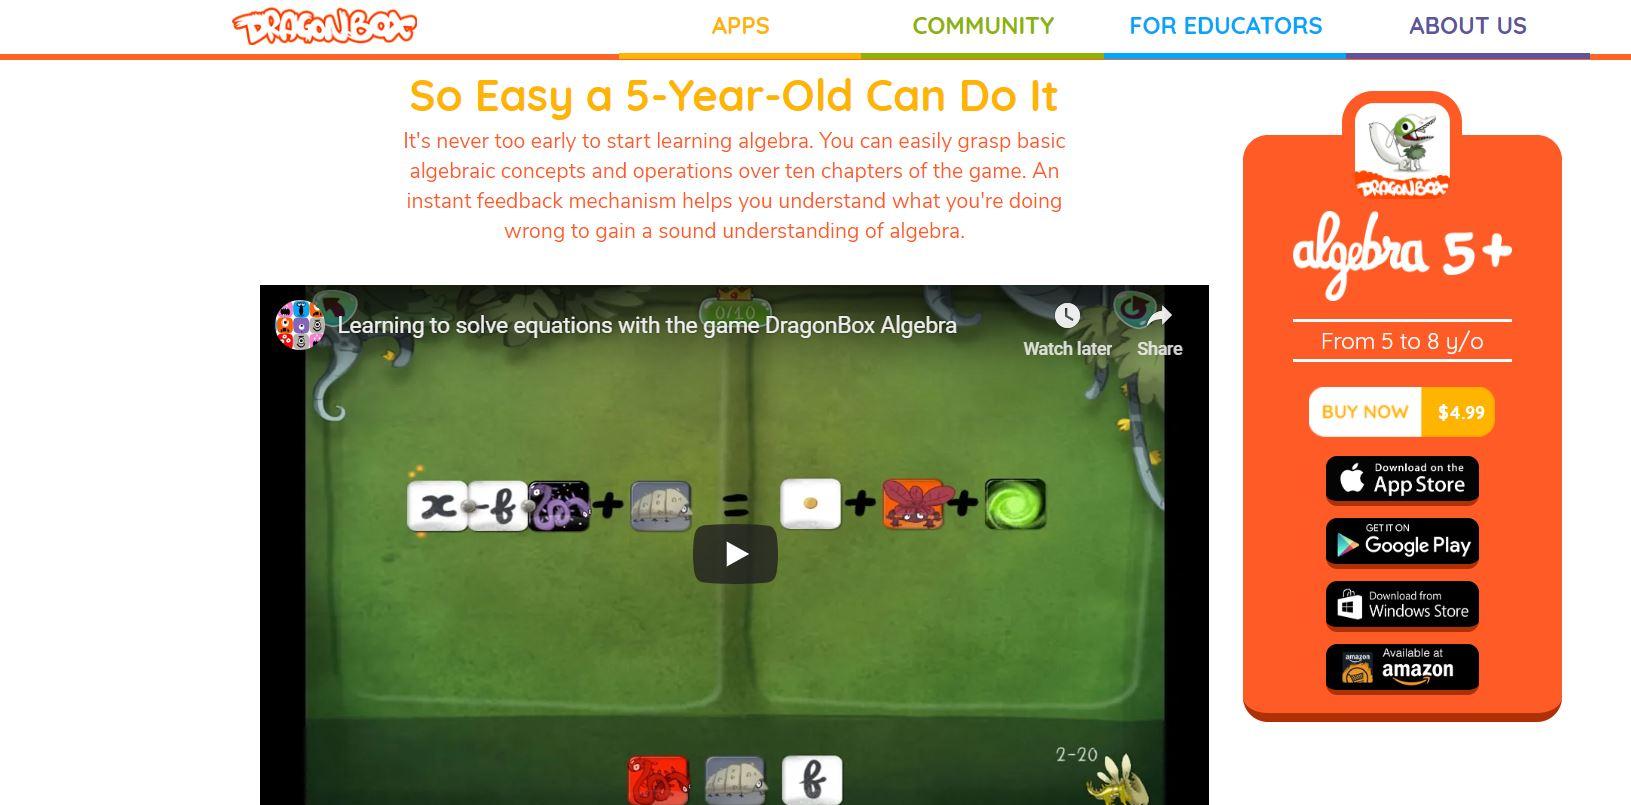 Dragonbox Algebra 5+ CodaKid Top 21 Math Apps of 2019